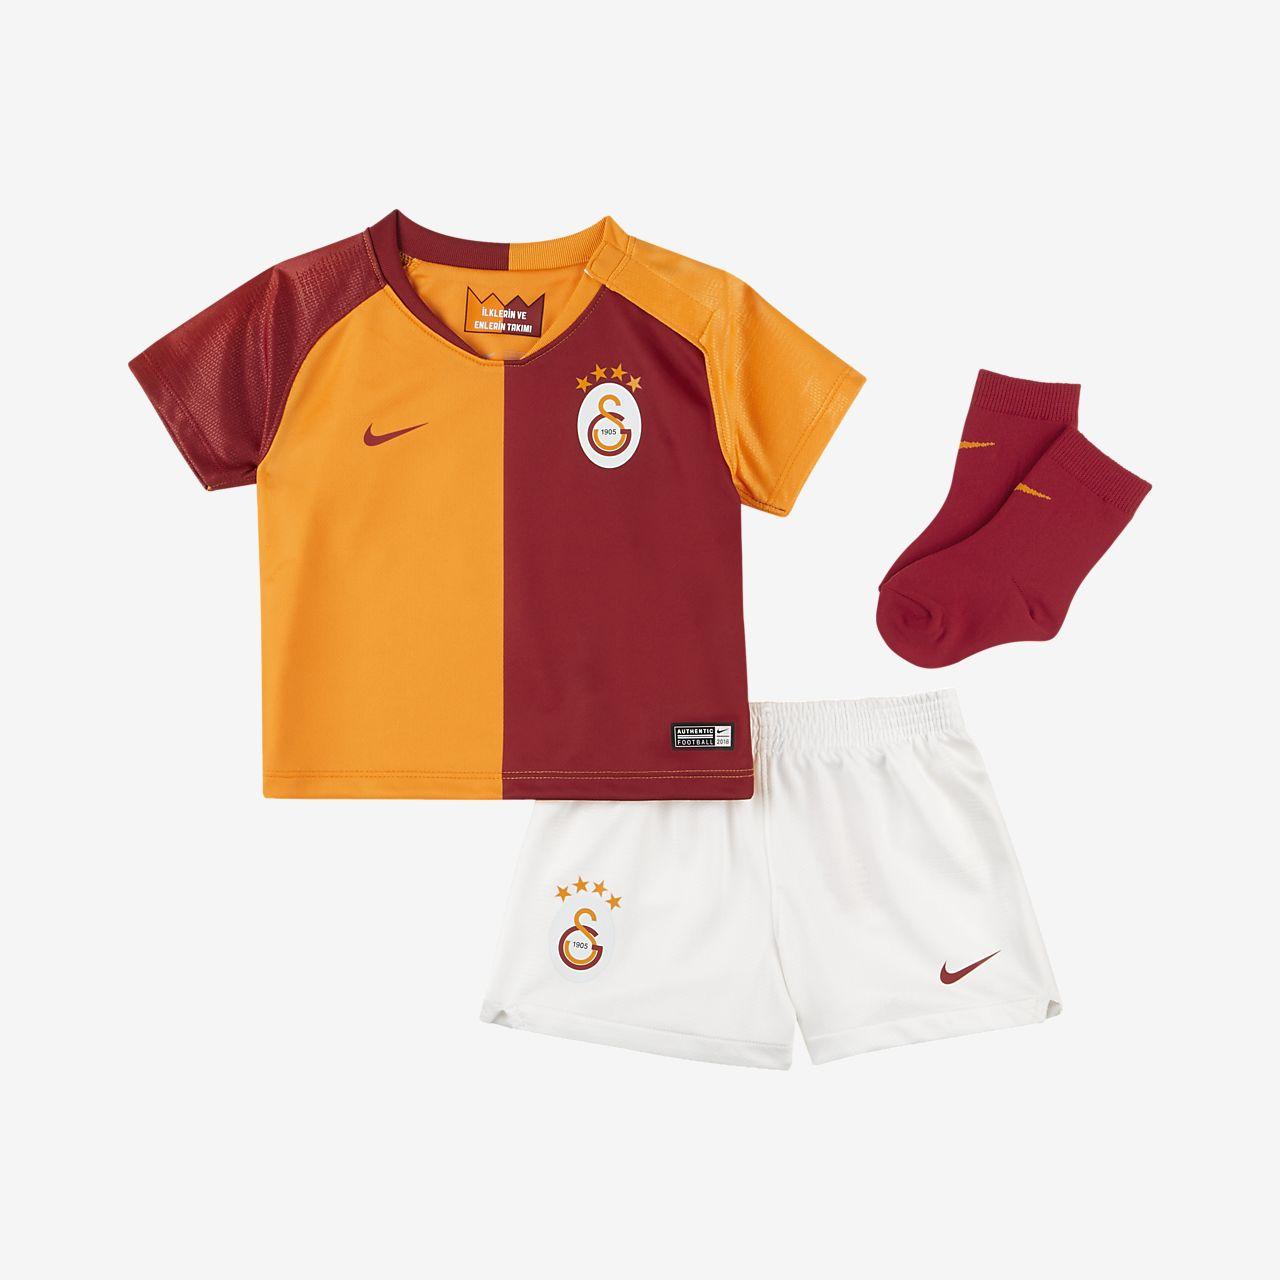 d237ac6b3 2018/19 Galatasaray S.K.Stadium Home Baby & Toddler Football Kit ...